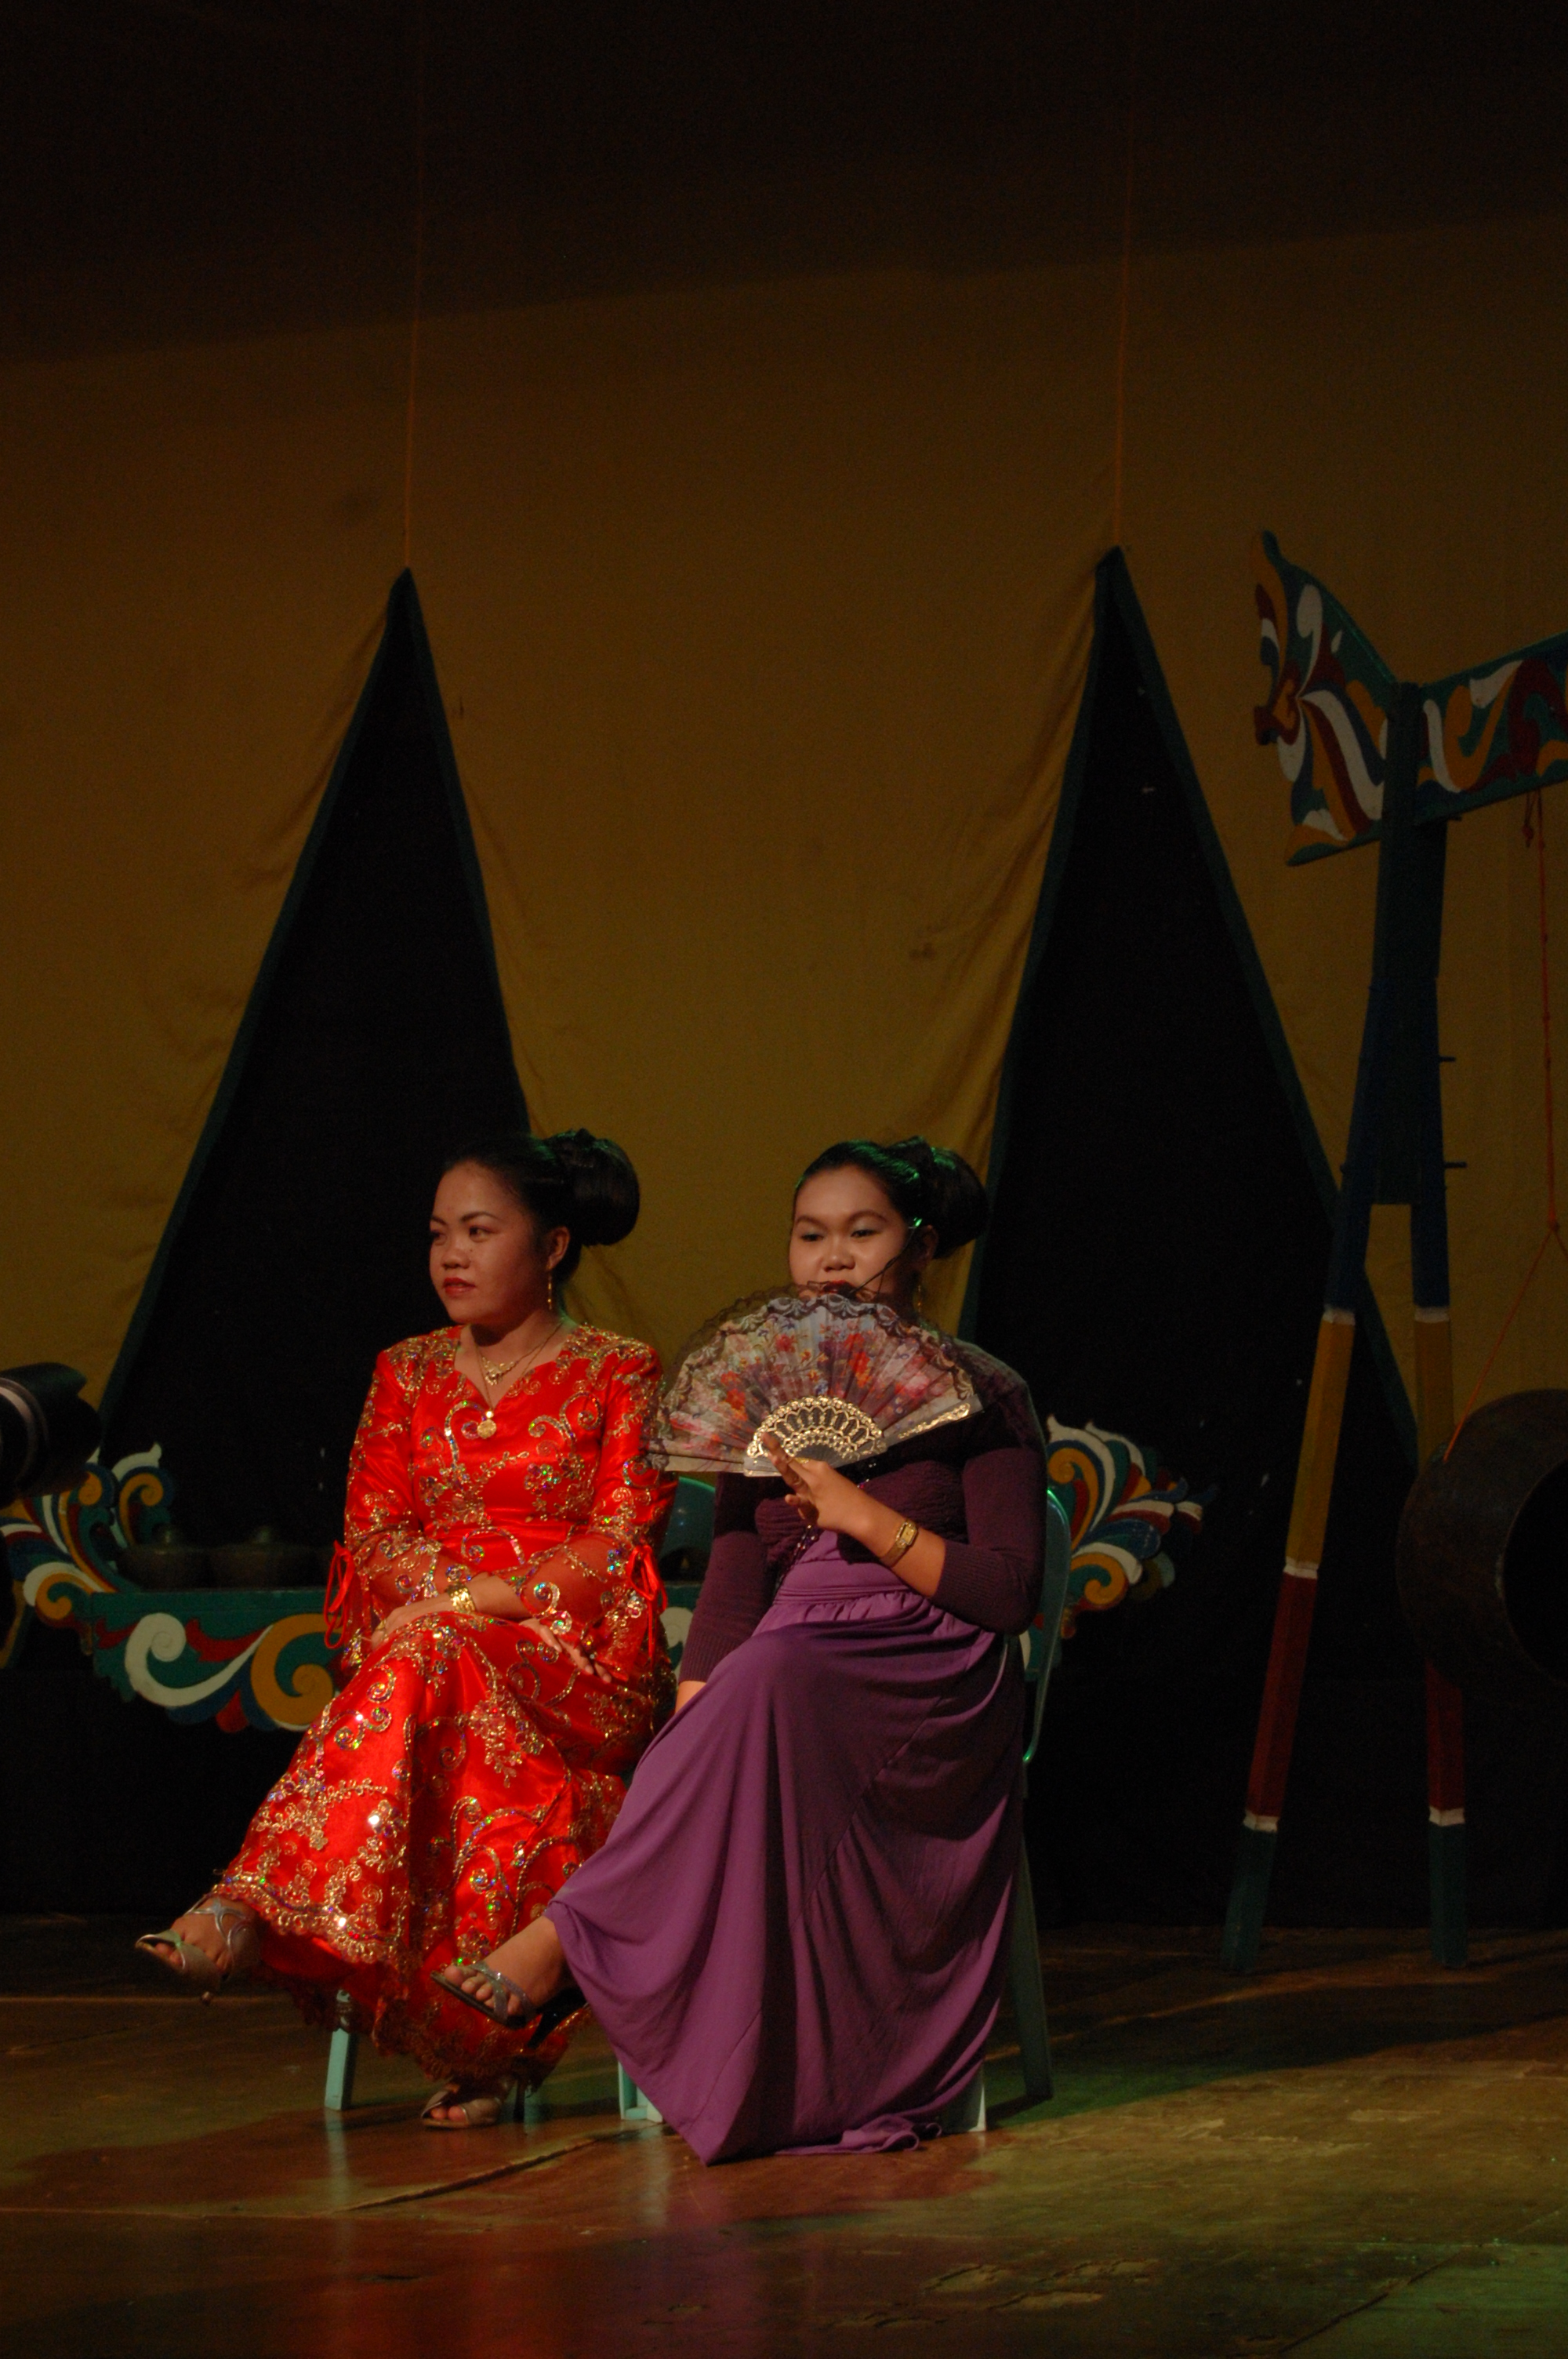 Darangen epic of the Maranao people of Lake Lanao - Philippines Bernard Joseph Esposo Guerrero